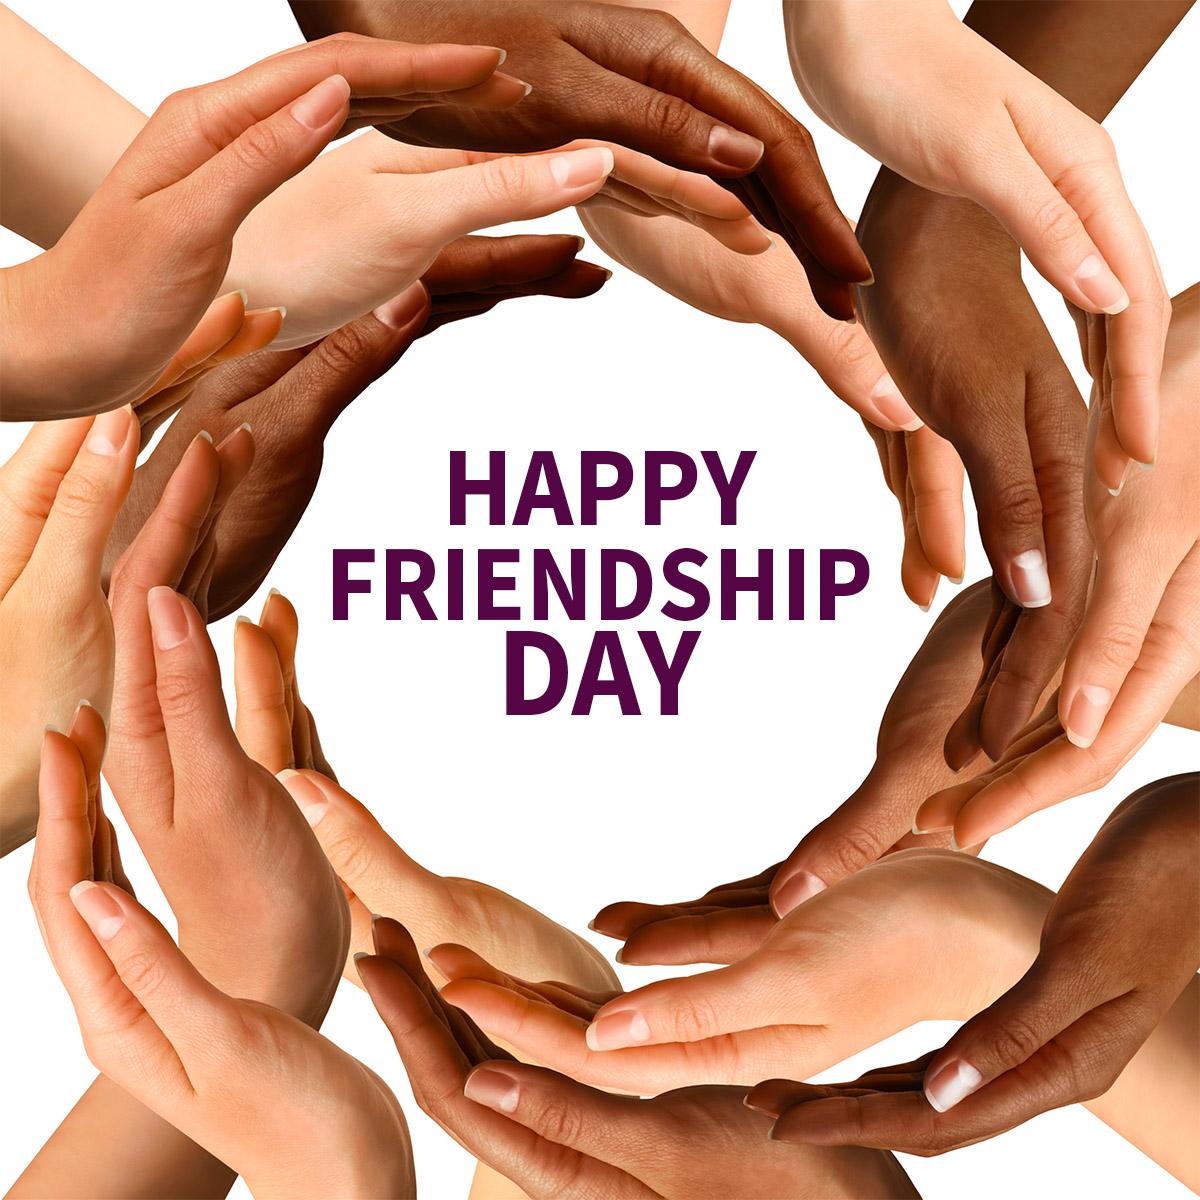 Happy Friendship Day!!!